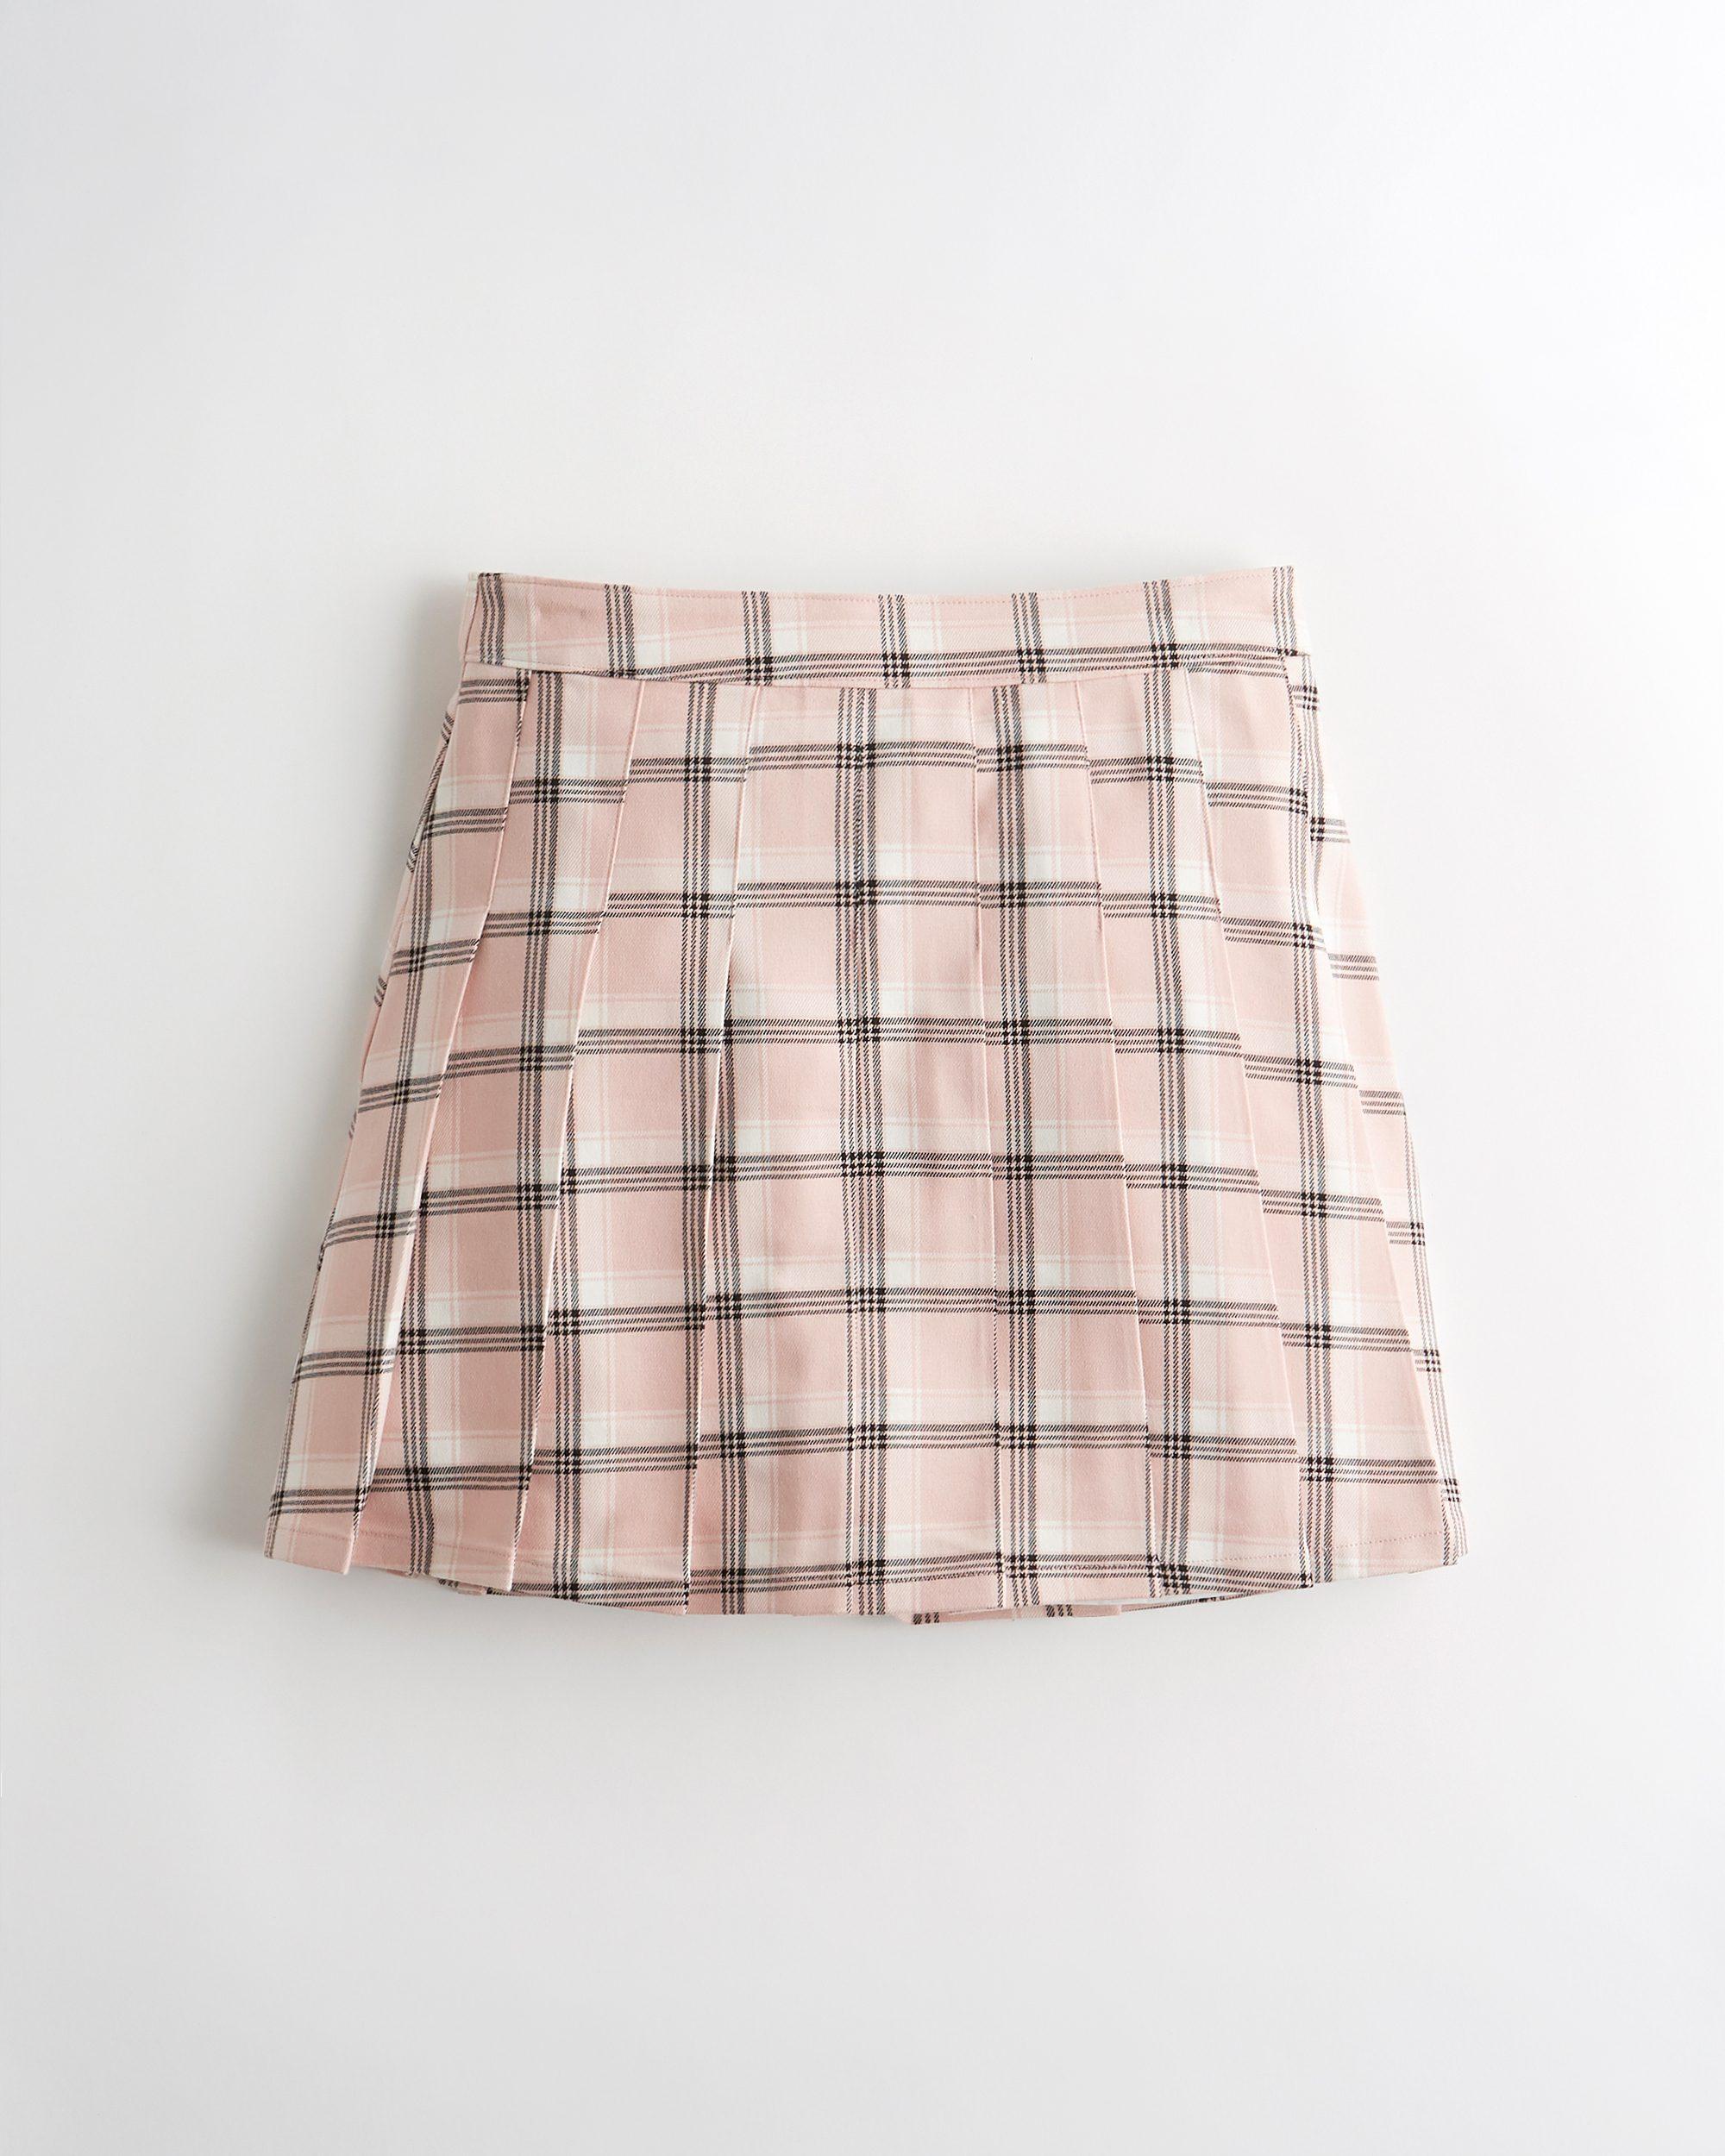 Hollister - Ultra High-Rise Pleated Mini Skirt (Light Pink Plaid) - £29 - www.hollisterco.com